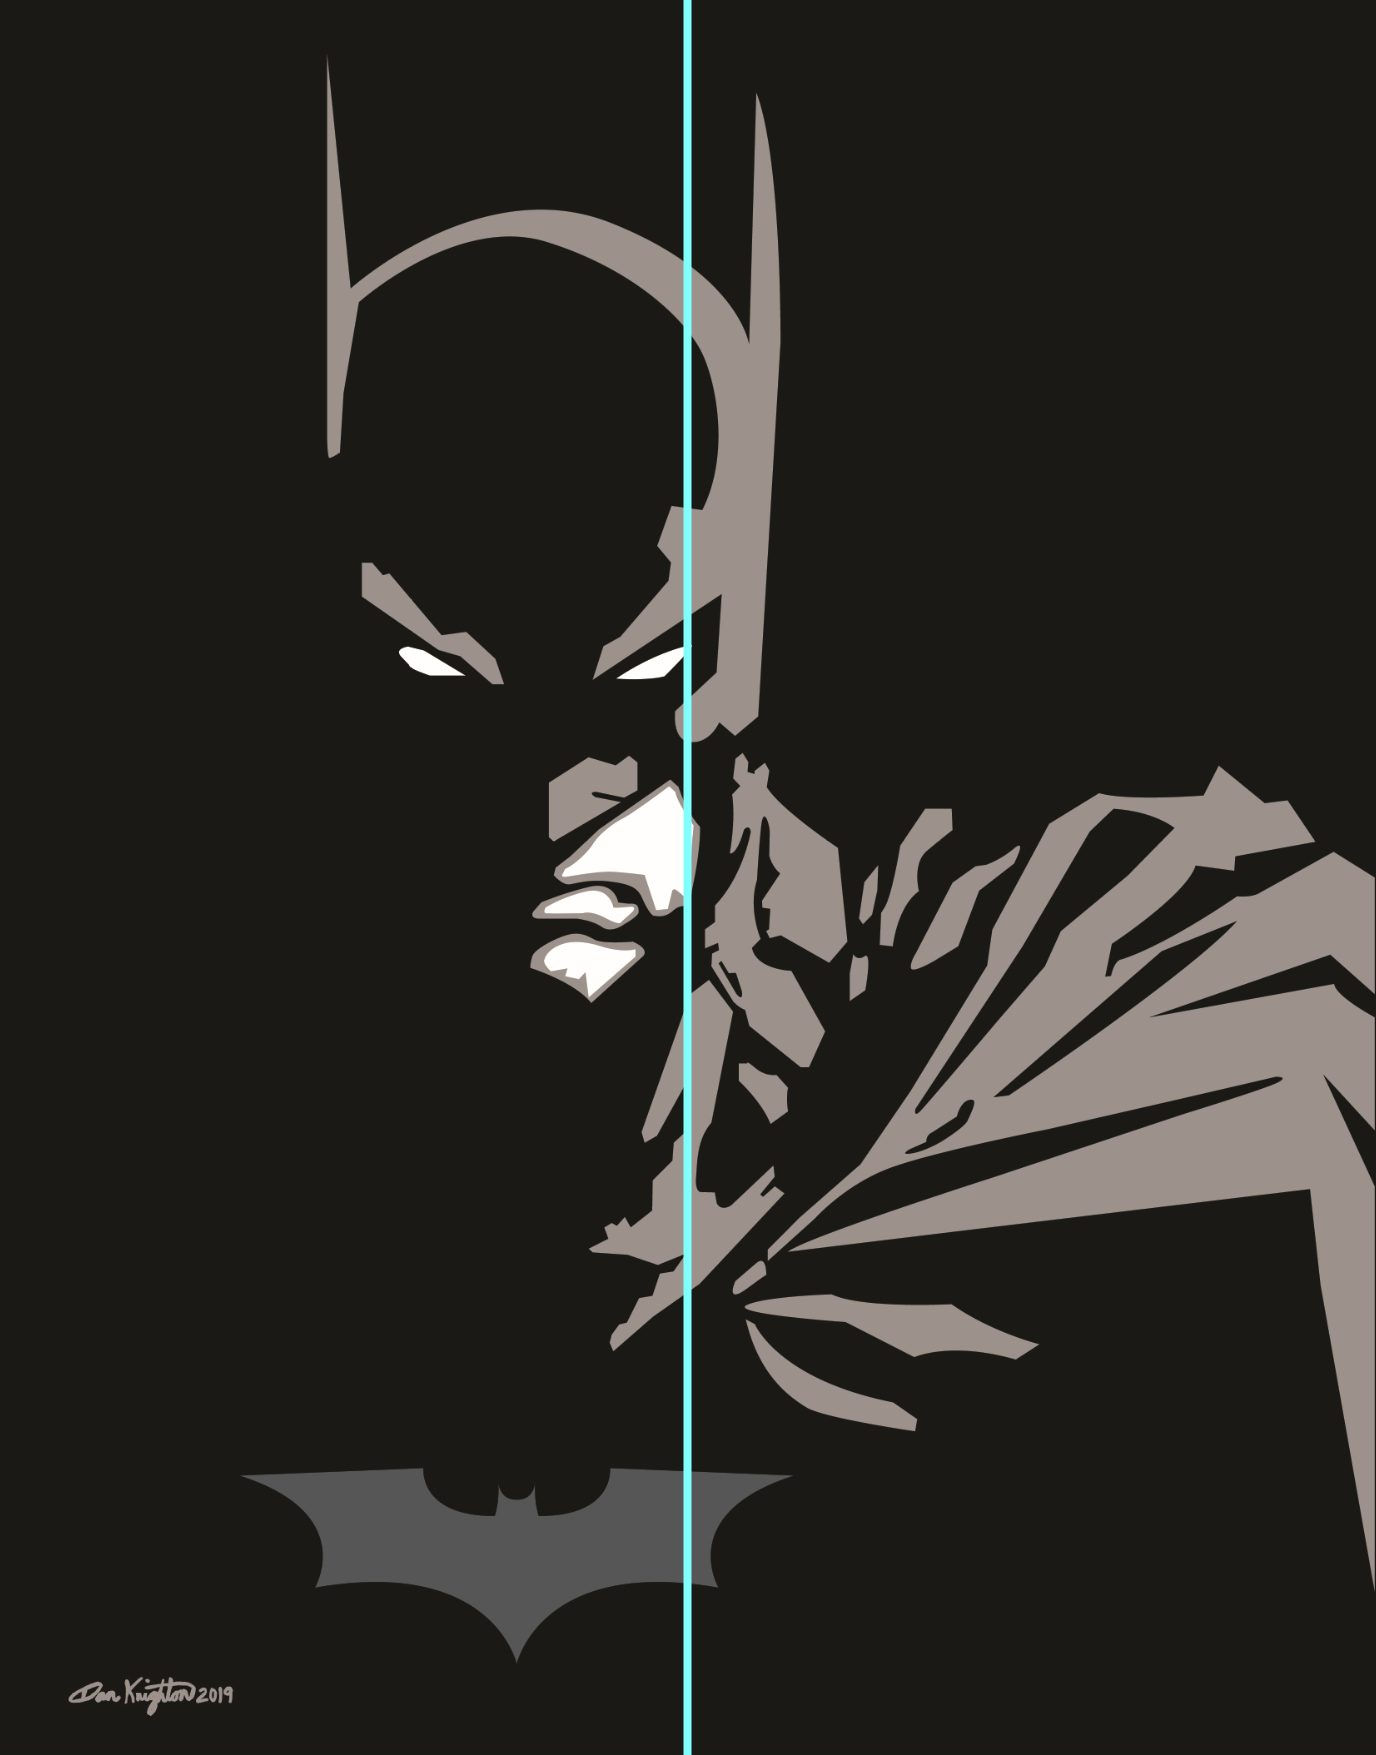 Art by DAK - Vector Batman